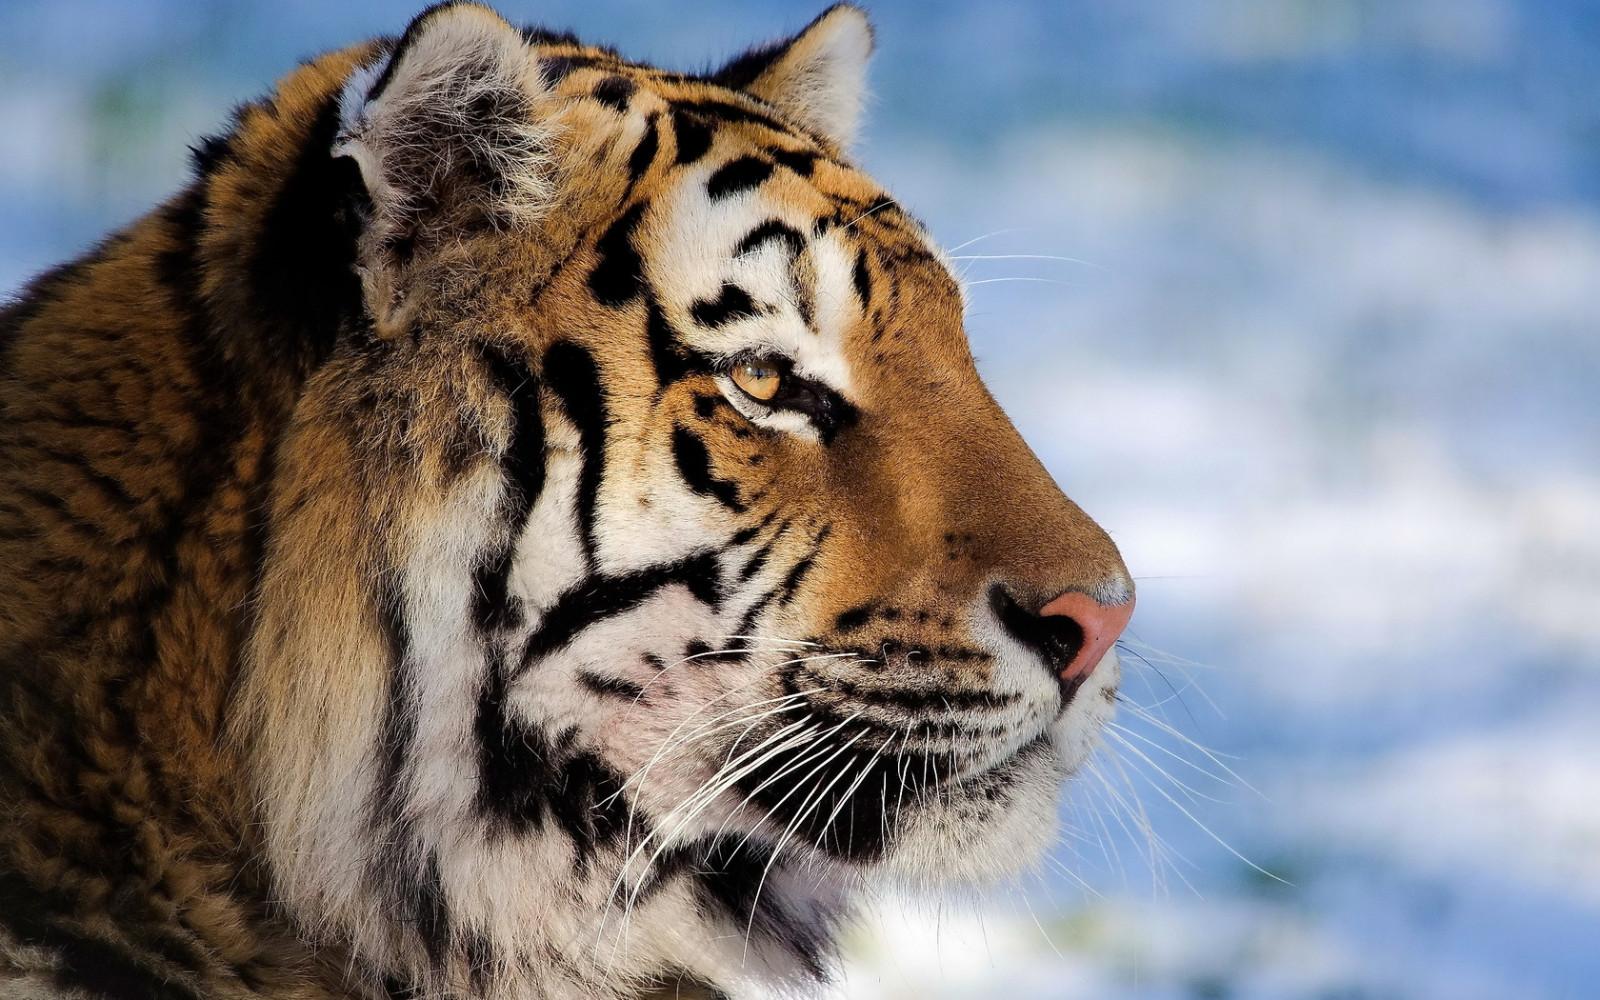 Fond d'écran : tigre, visage, profil, rayé, gros chat 1680x1050 - - 1065283 - Fond d'écran ...